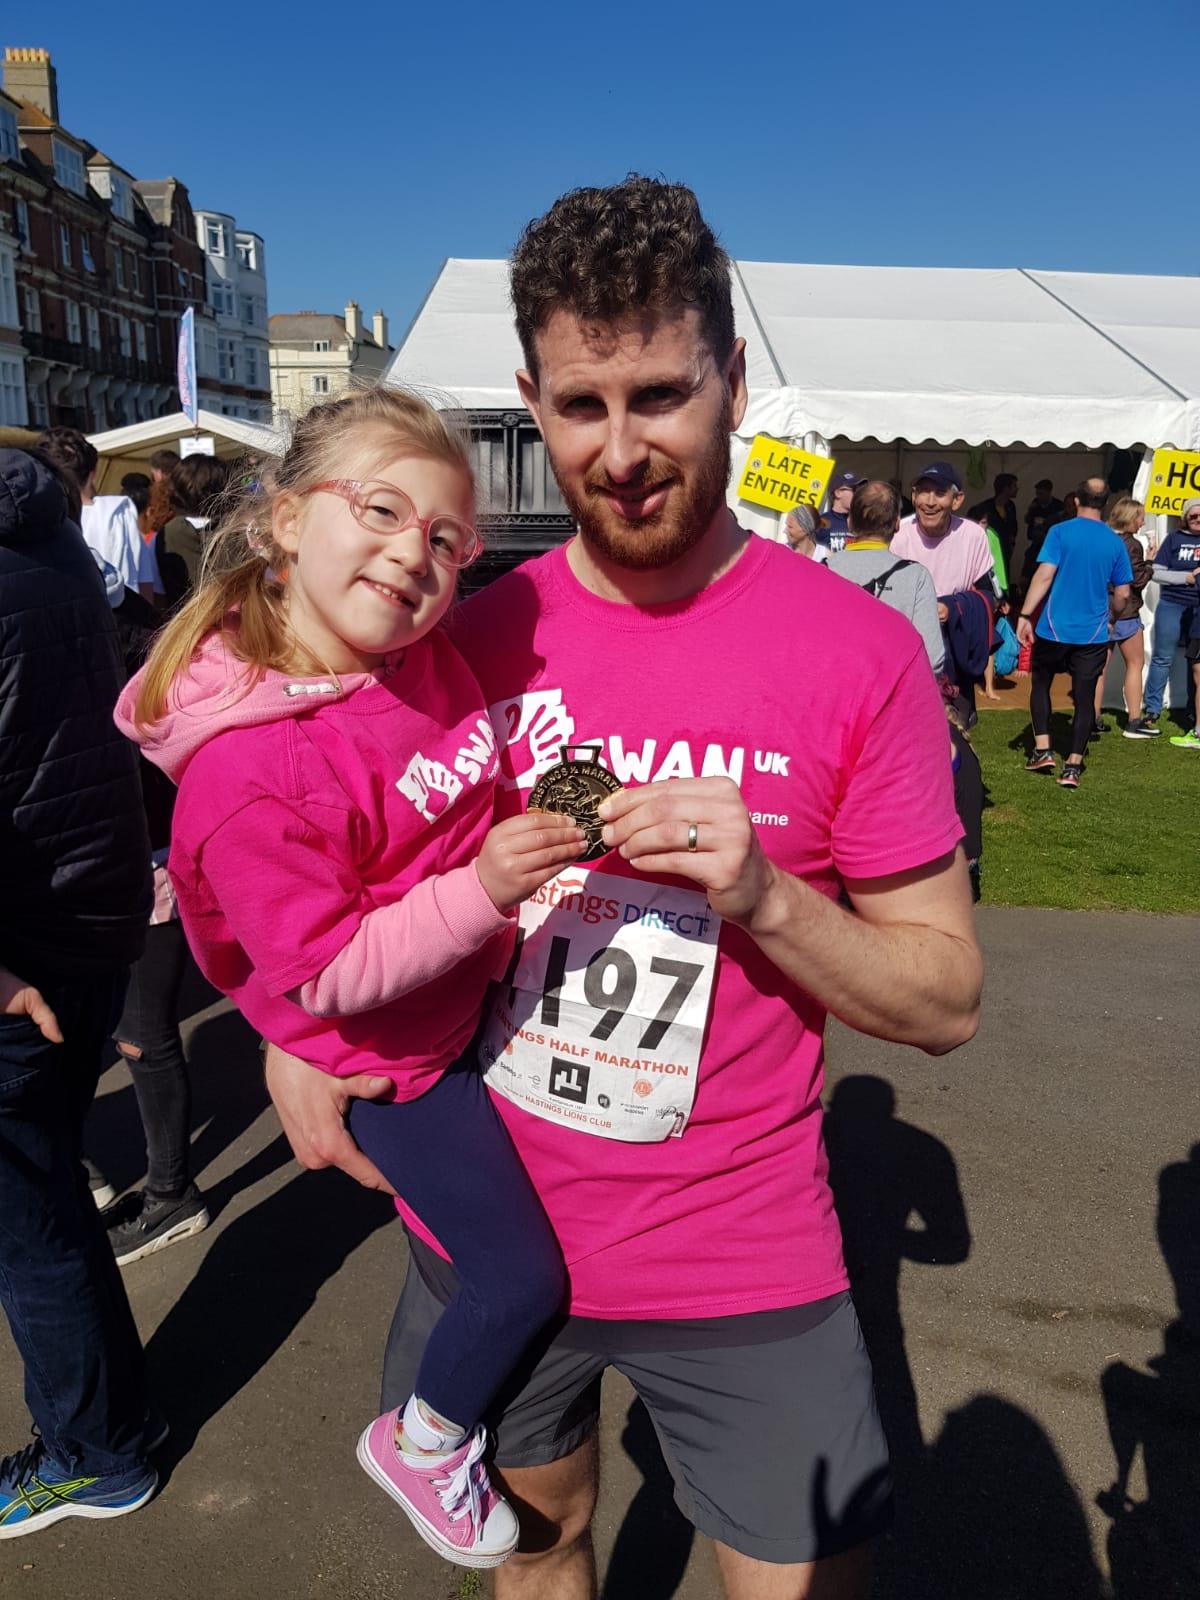 Adam and Millie run the Hastings Half Marathon